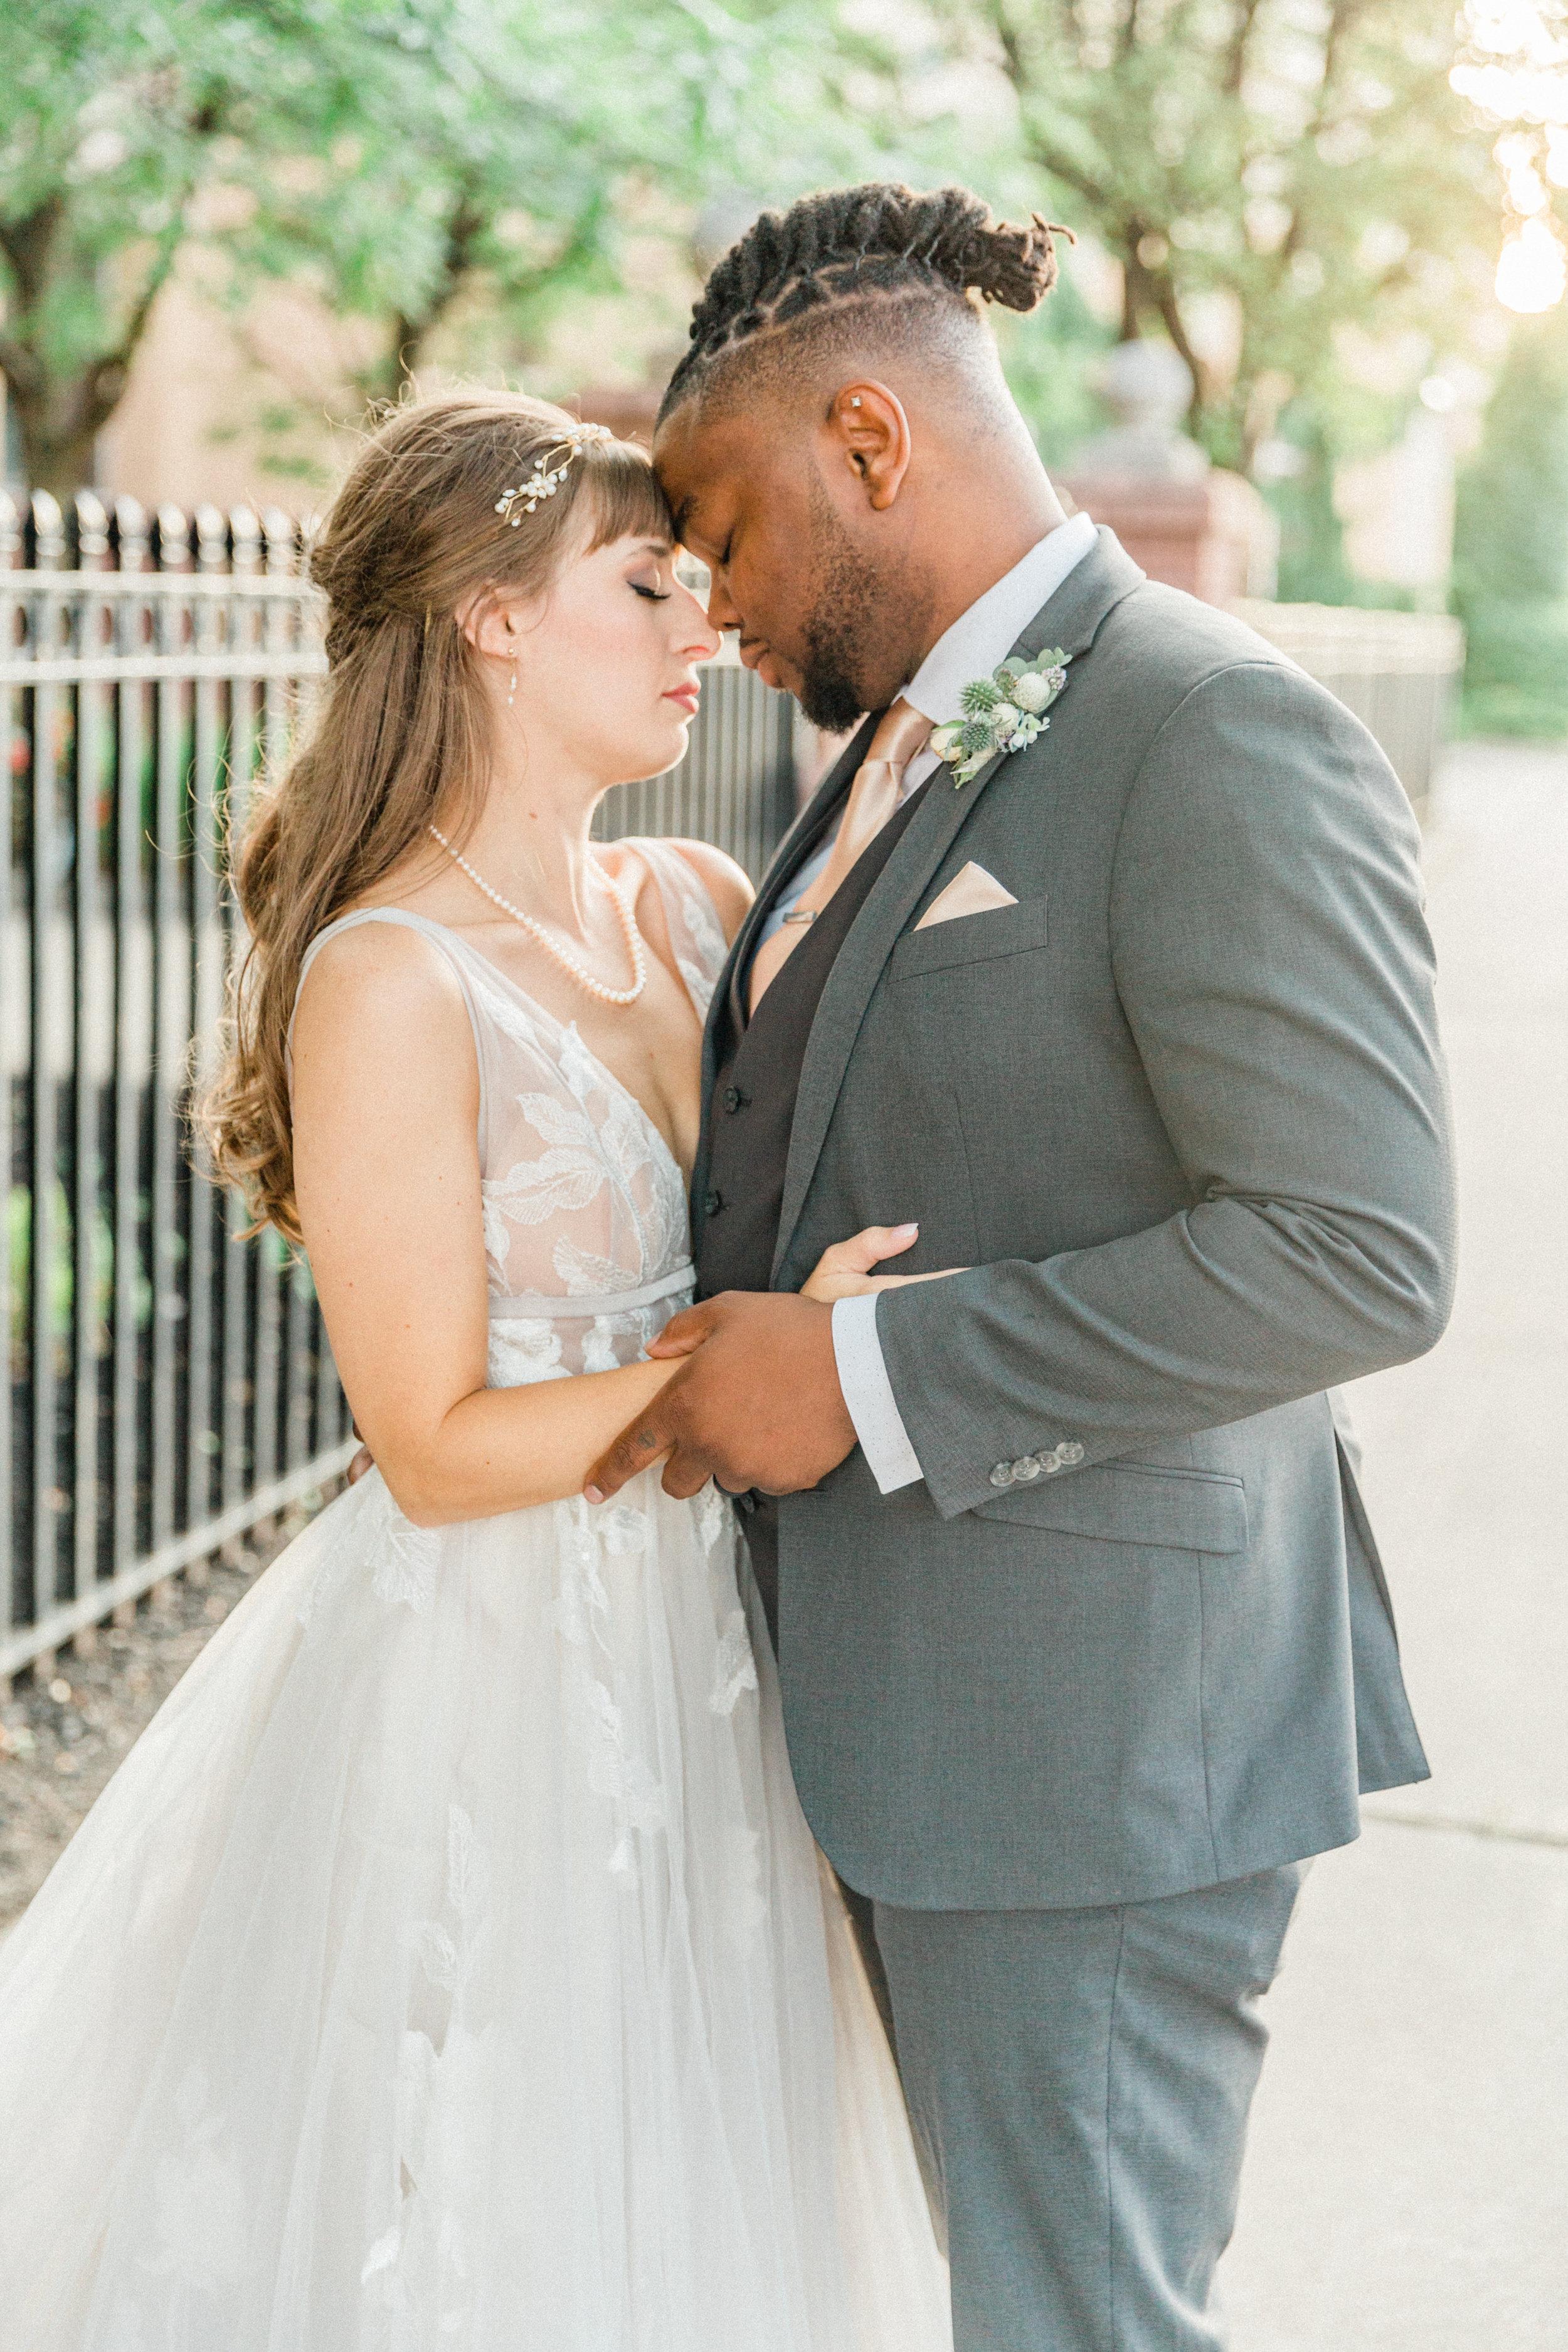 Mallory and Aaron - Married - Sneaks - Lauren Alisse Photography-78.jpg